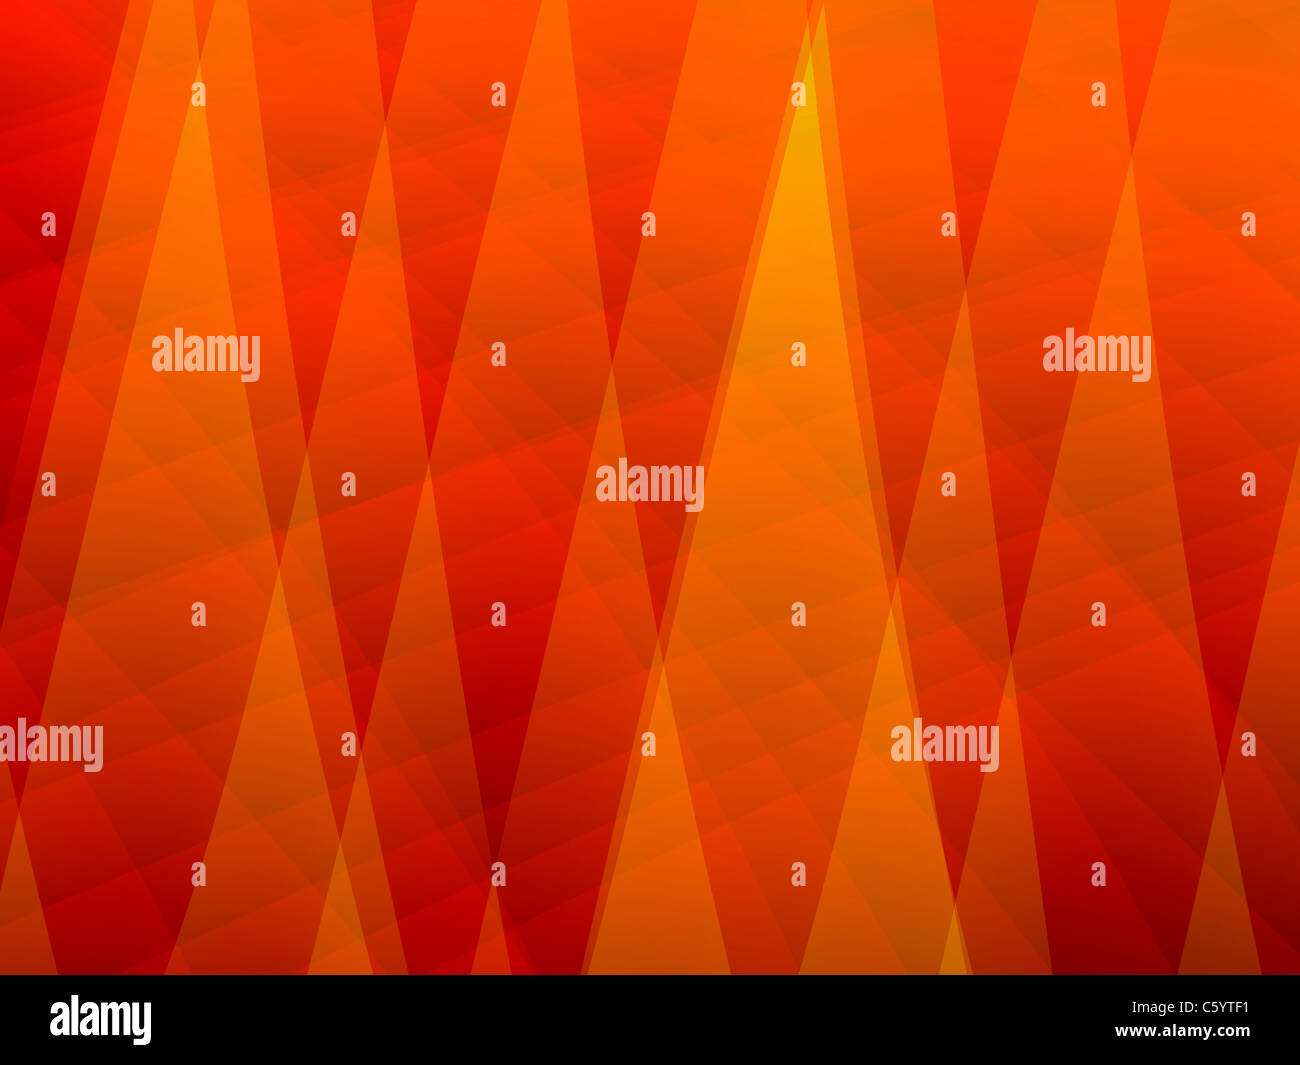 Abstract Orange Background - Stock Image